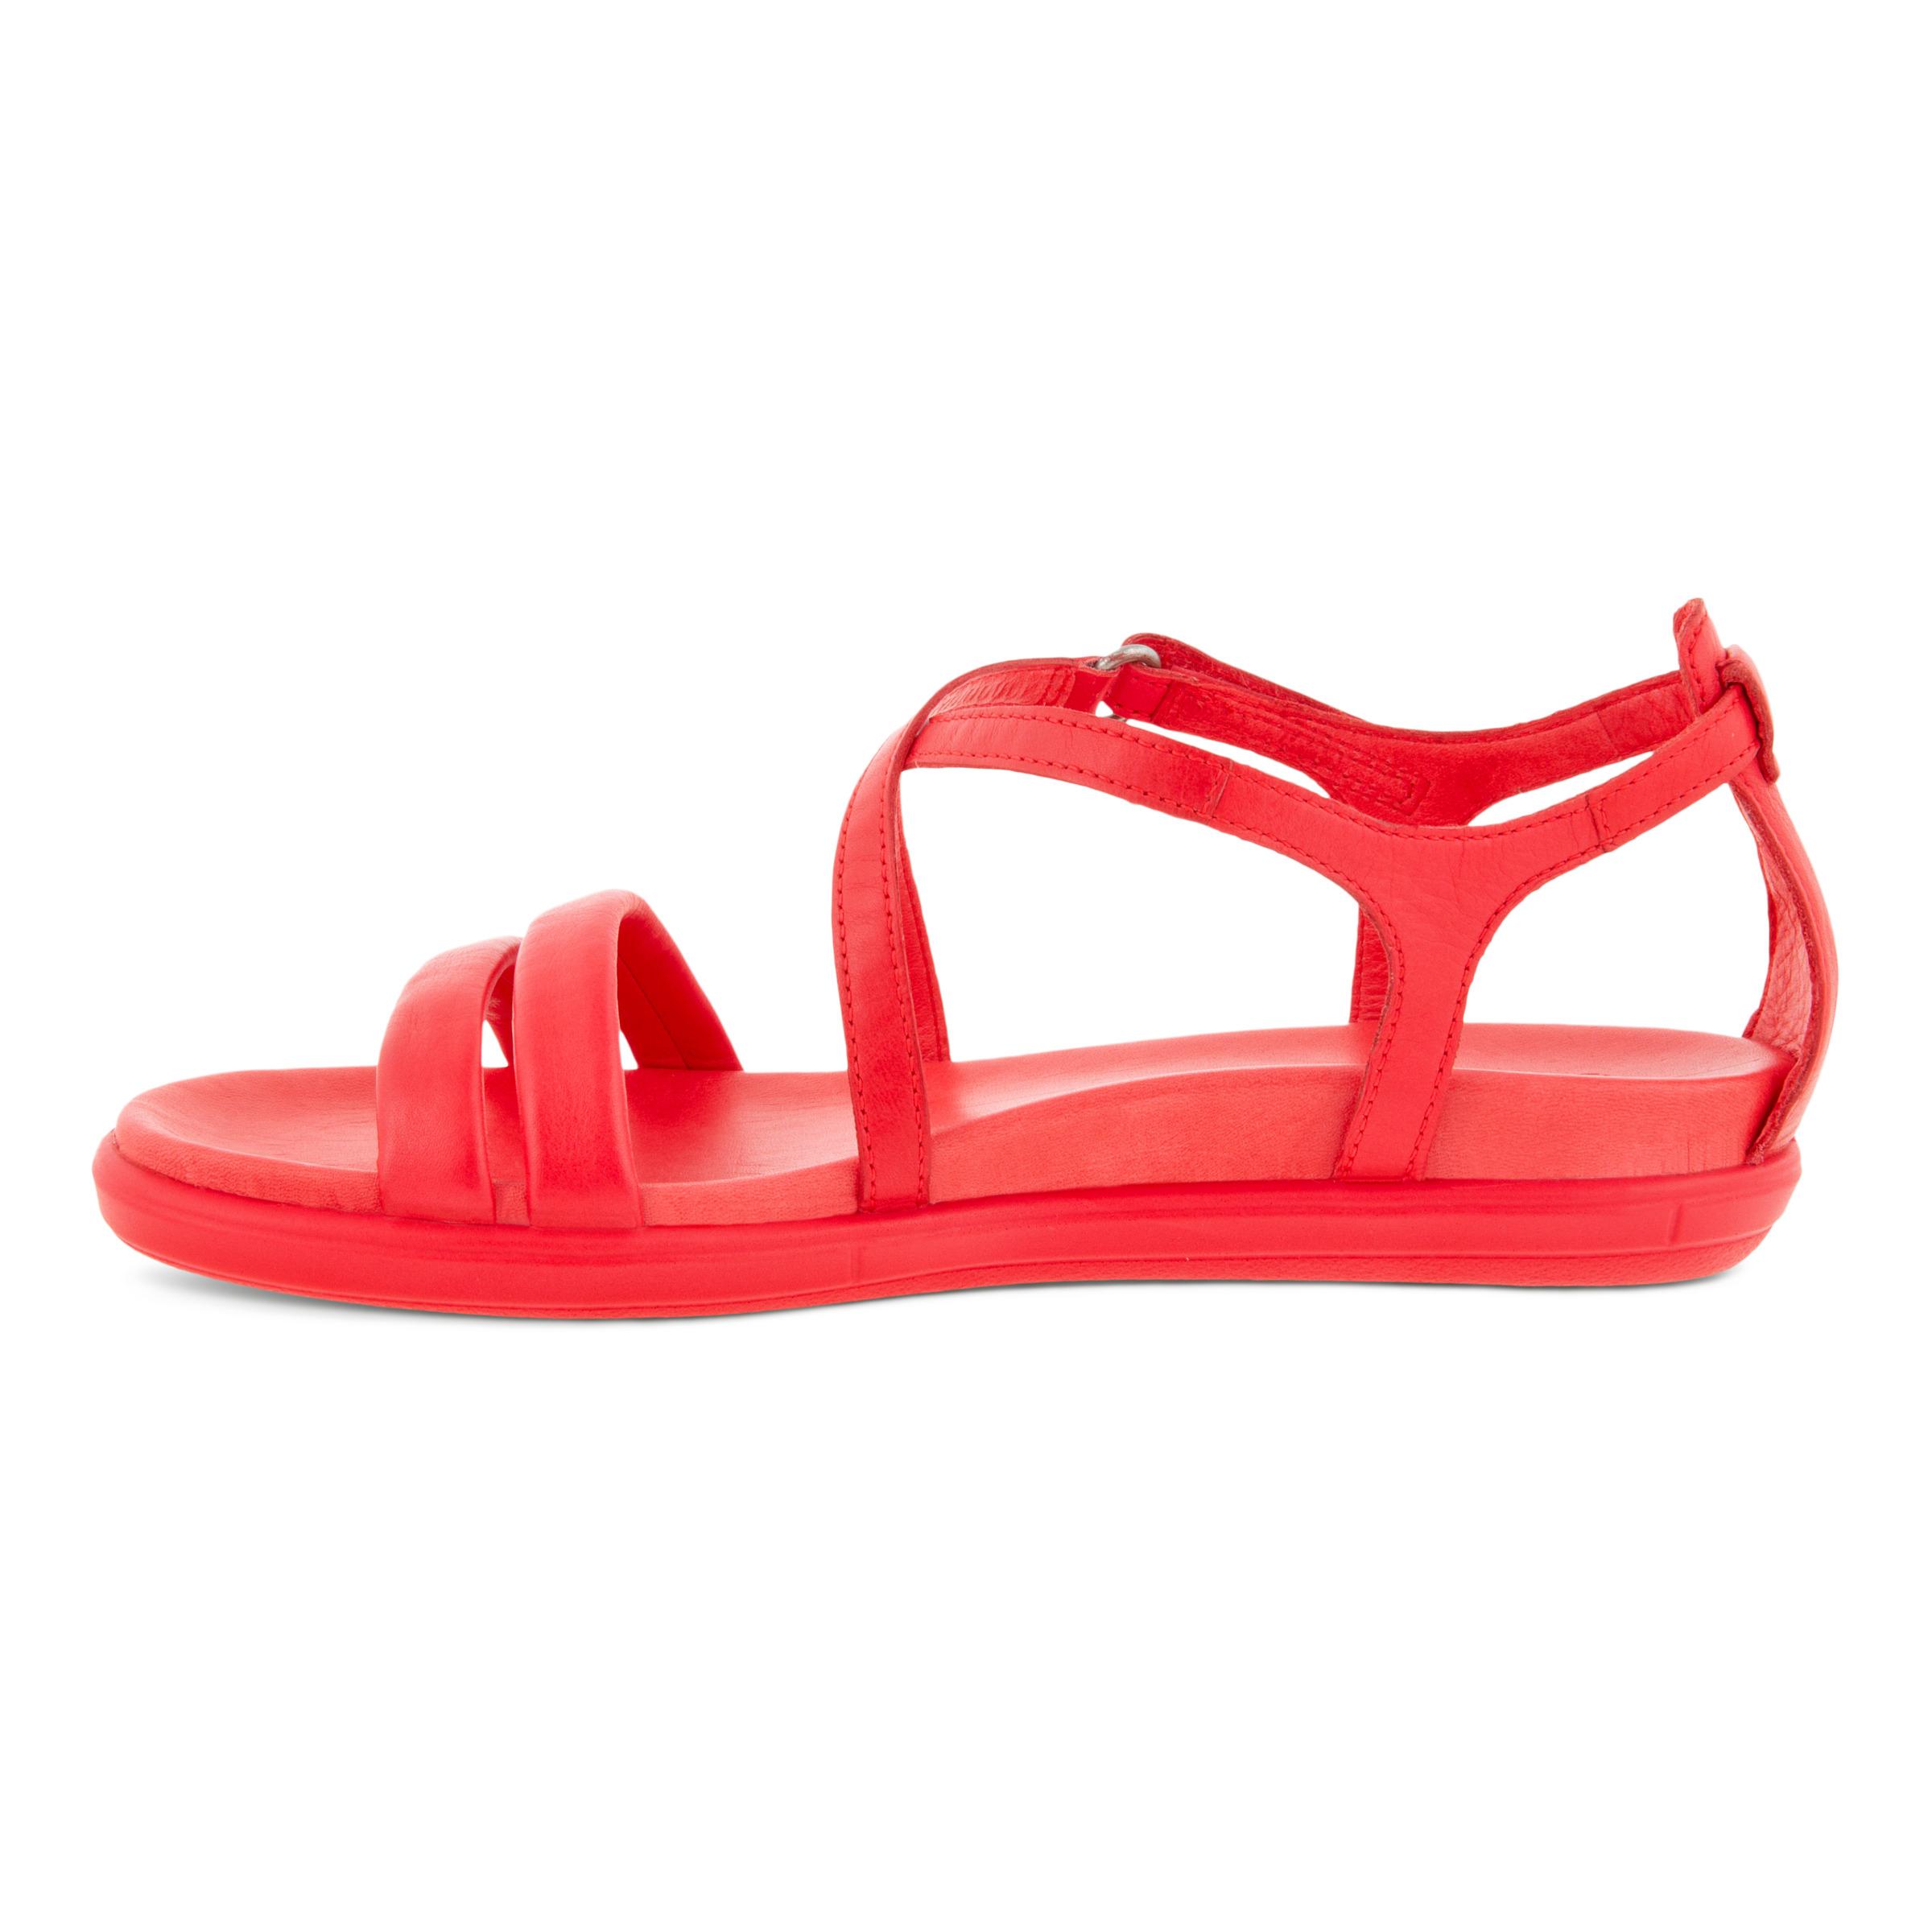 Ecco Simple sandal, red, 37